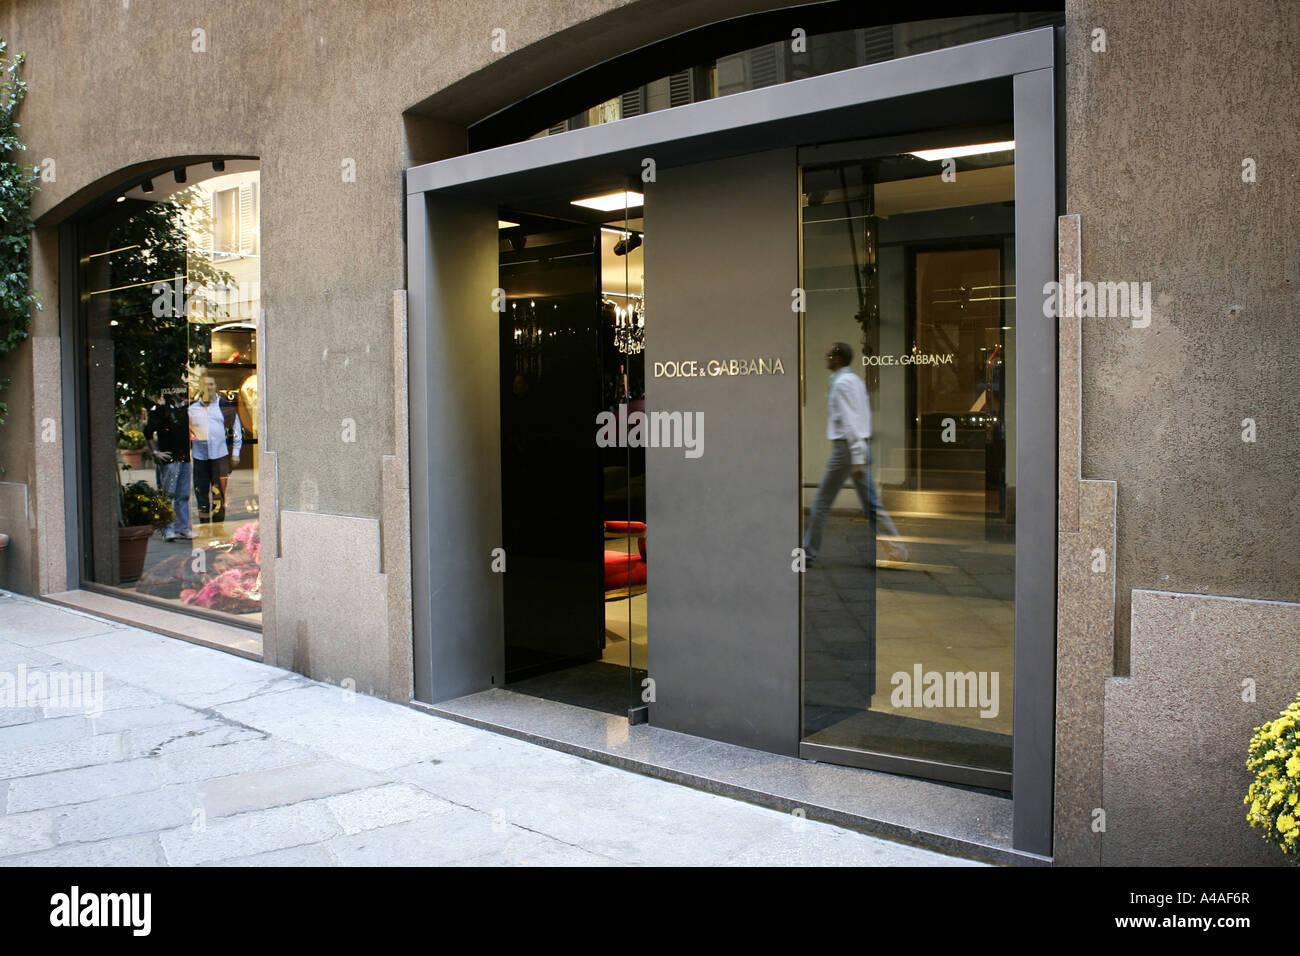 Dolce e Gabbana shop Via della Spiga Milan Lombardy Italy Stock ... 7eaea6f86fcbd